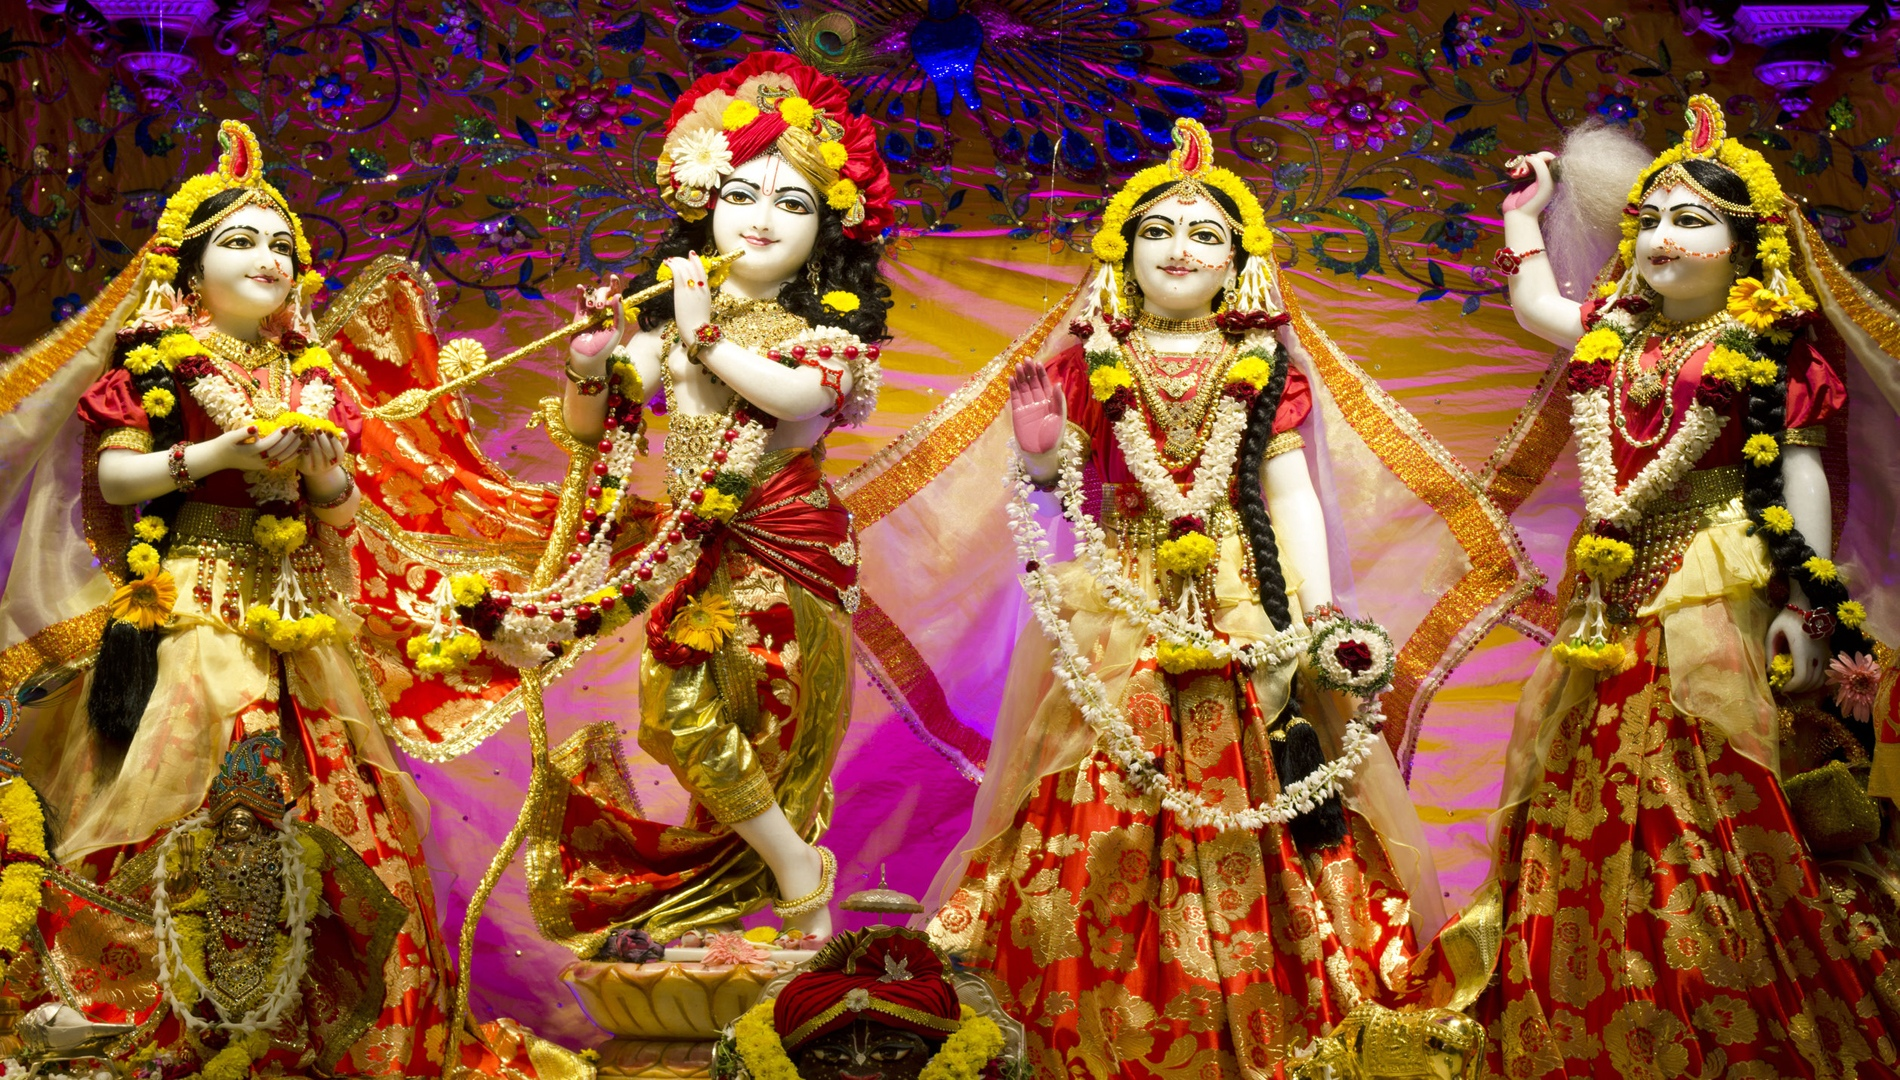 Lord Krishna And Radha In Iskcon Temple At Chennai - Iskcon Temple Lord Krishna - HD Wallpaper